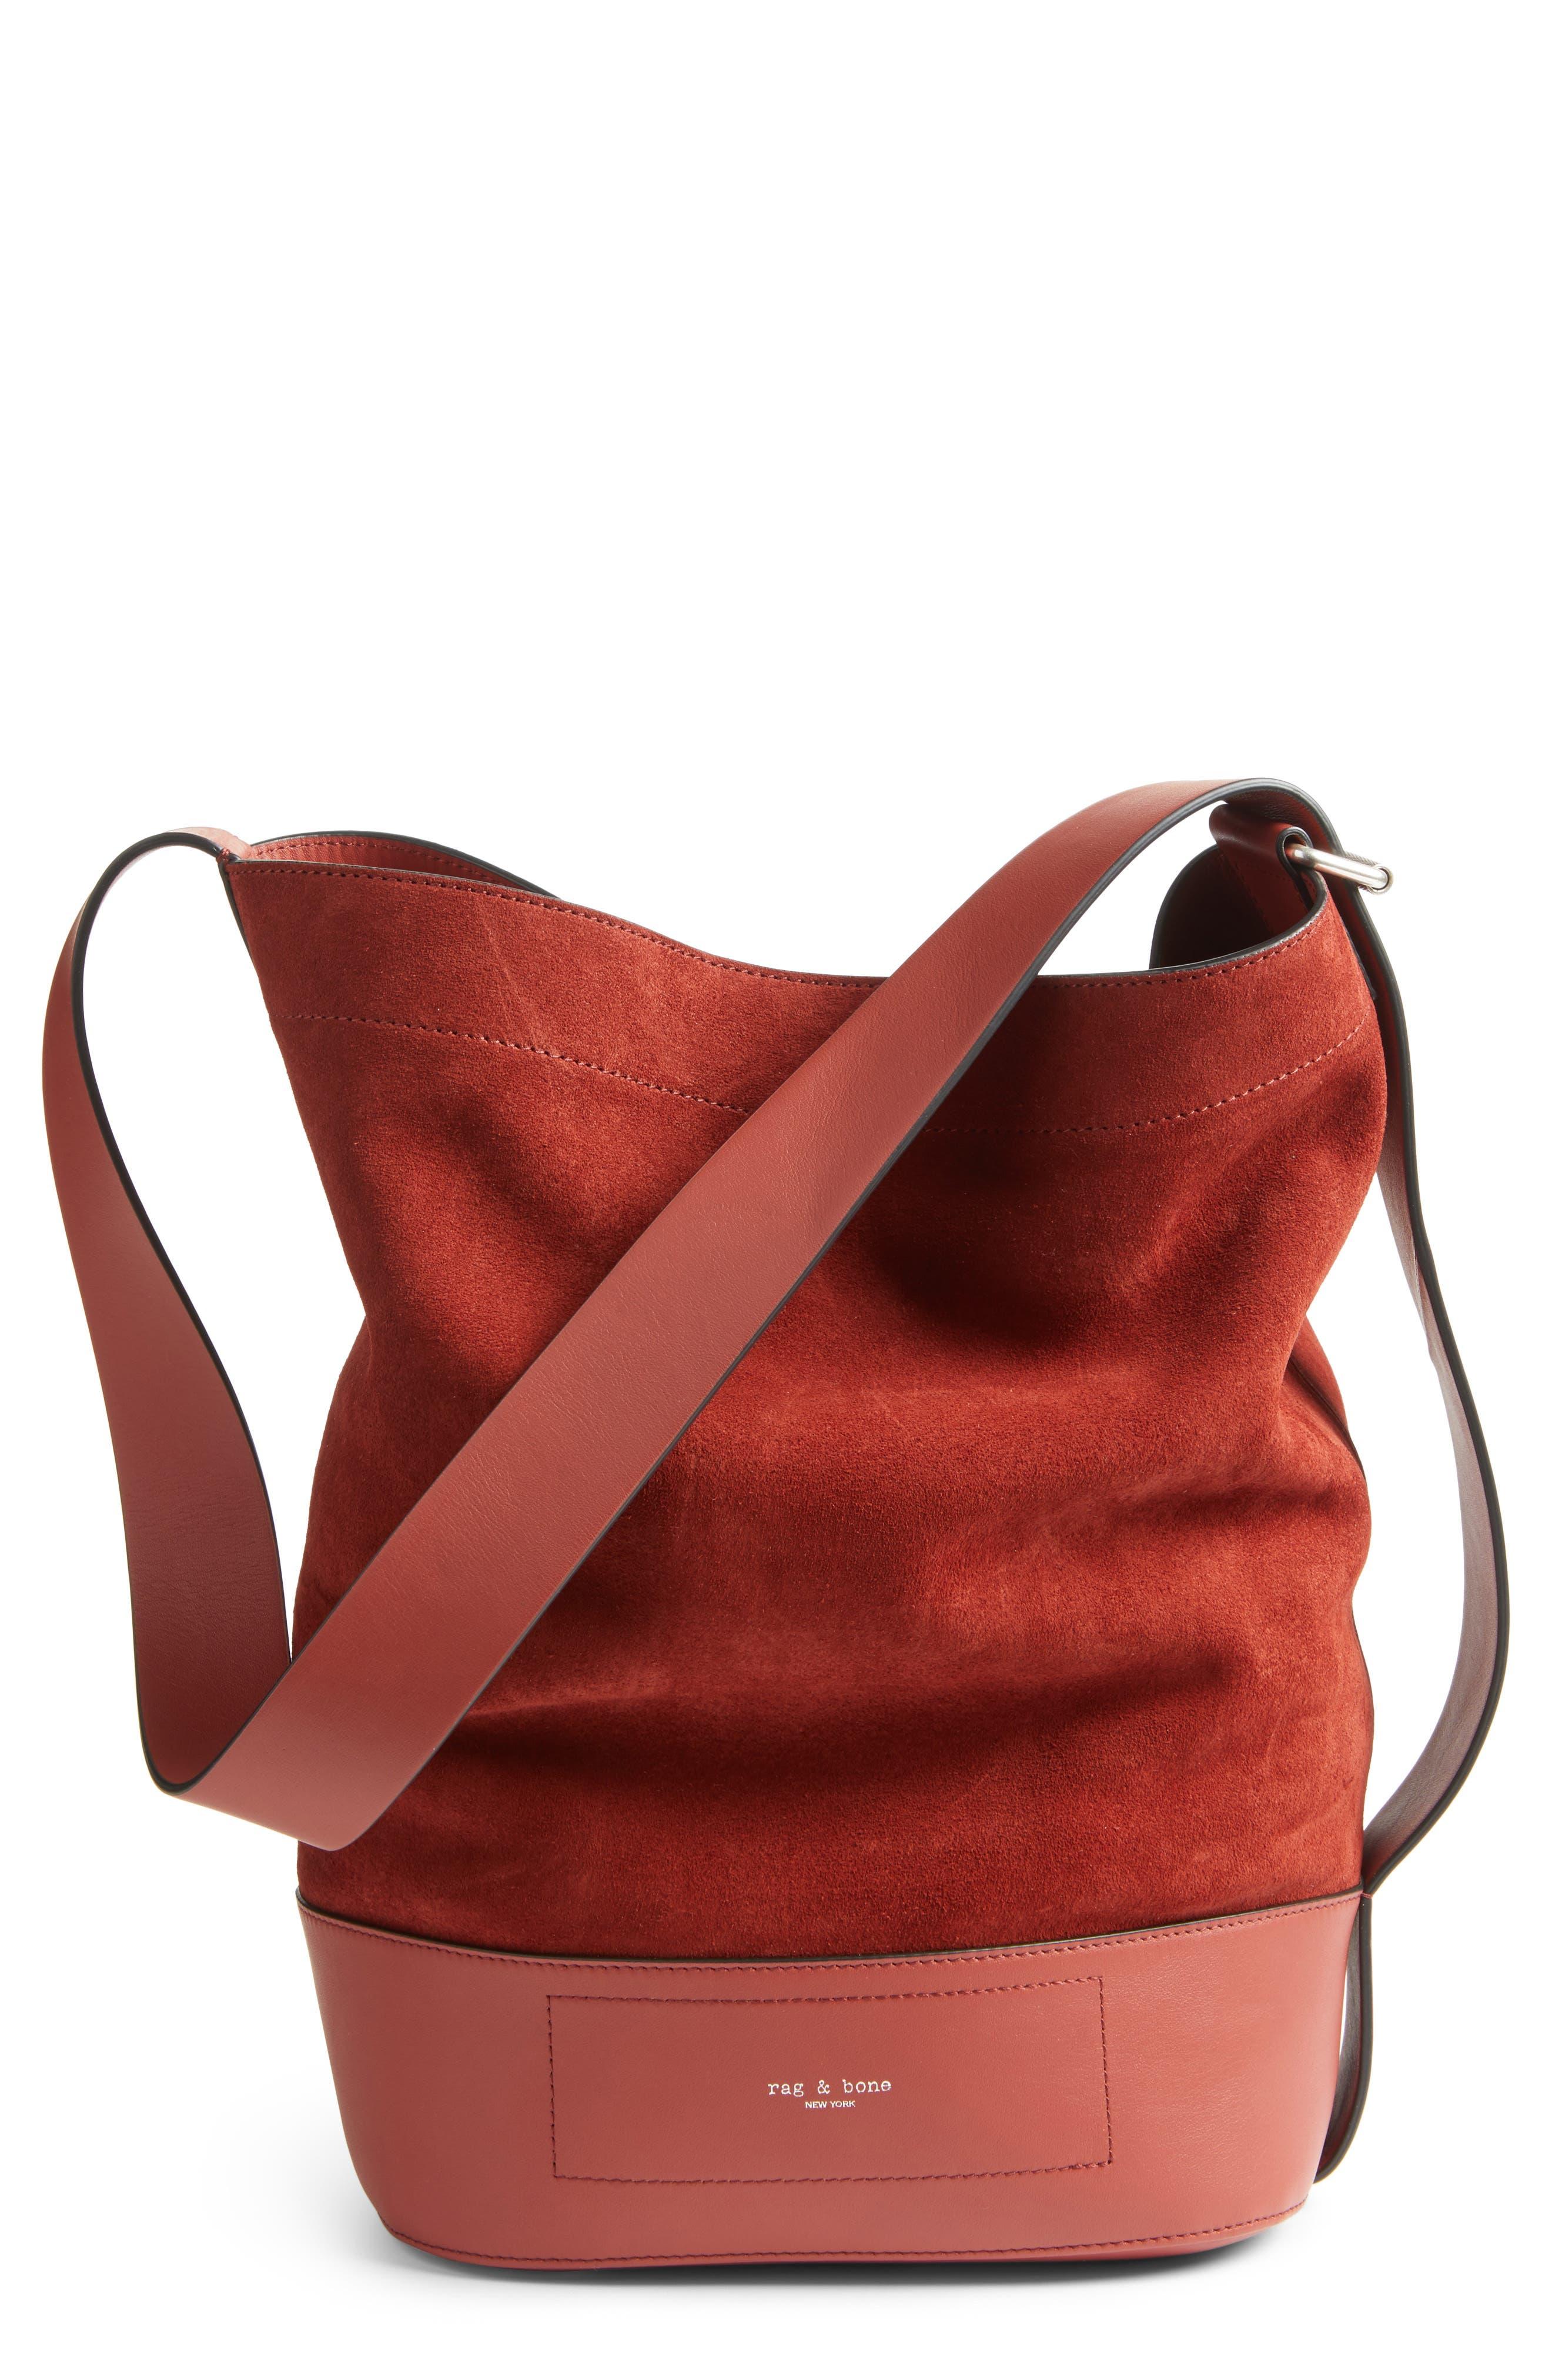 Alternate Image 1 Selected - rag and bone Walker Sling Leather & Suede Bucket Bag